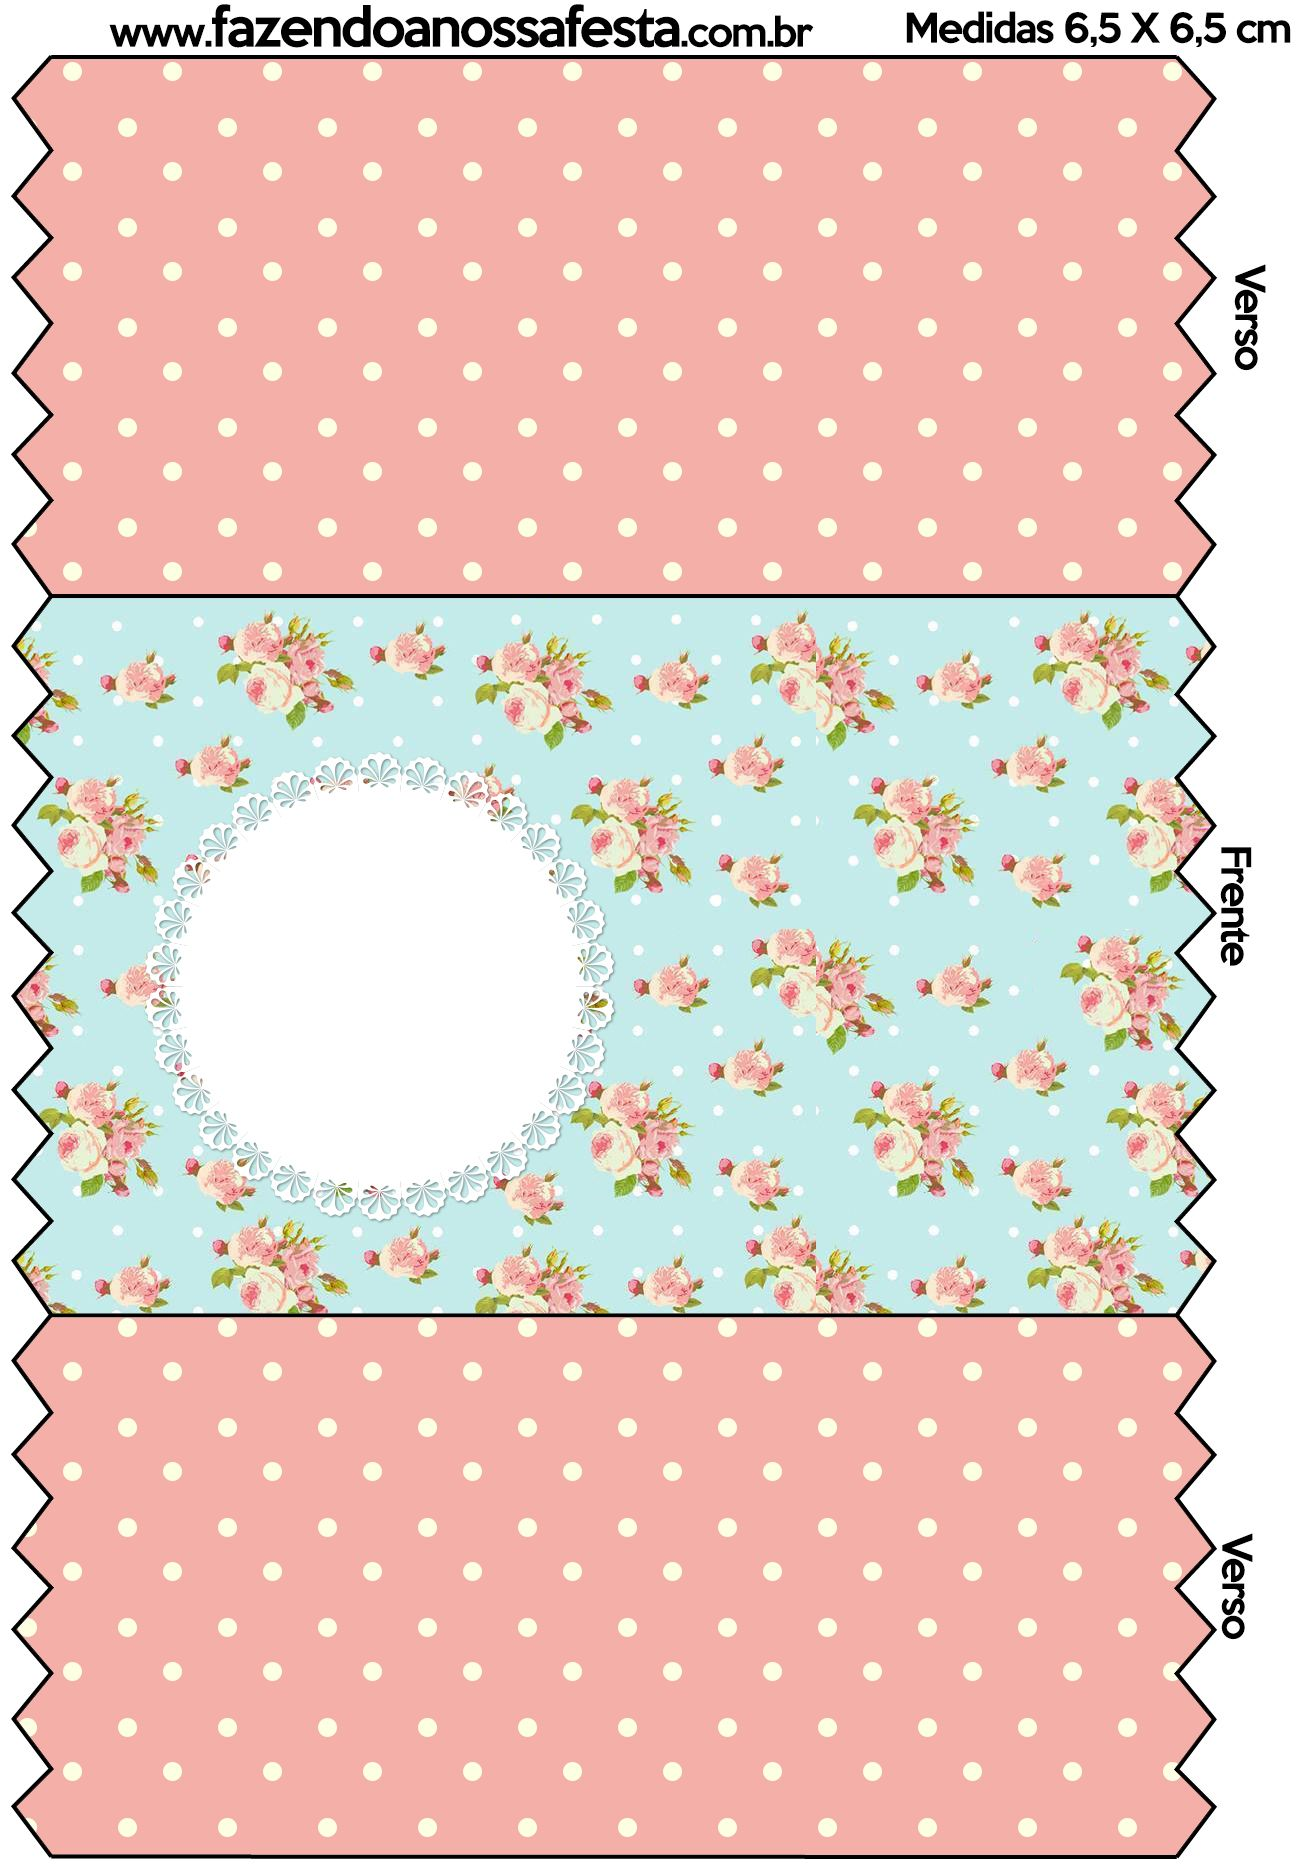 Kit Completo Floral Vintage Azul E Rosa Com Molduras Para Convites